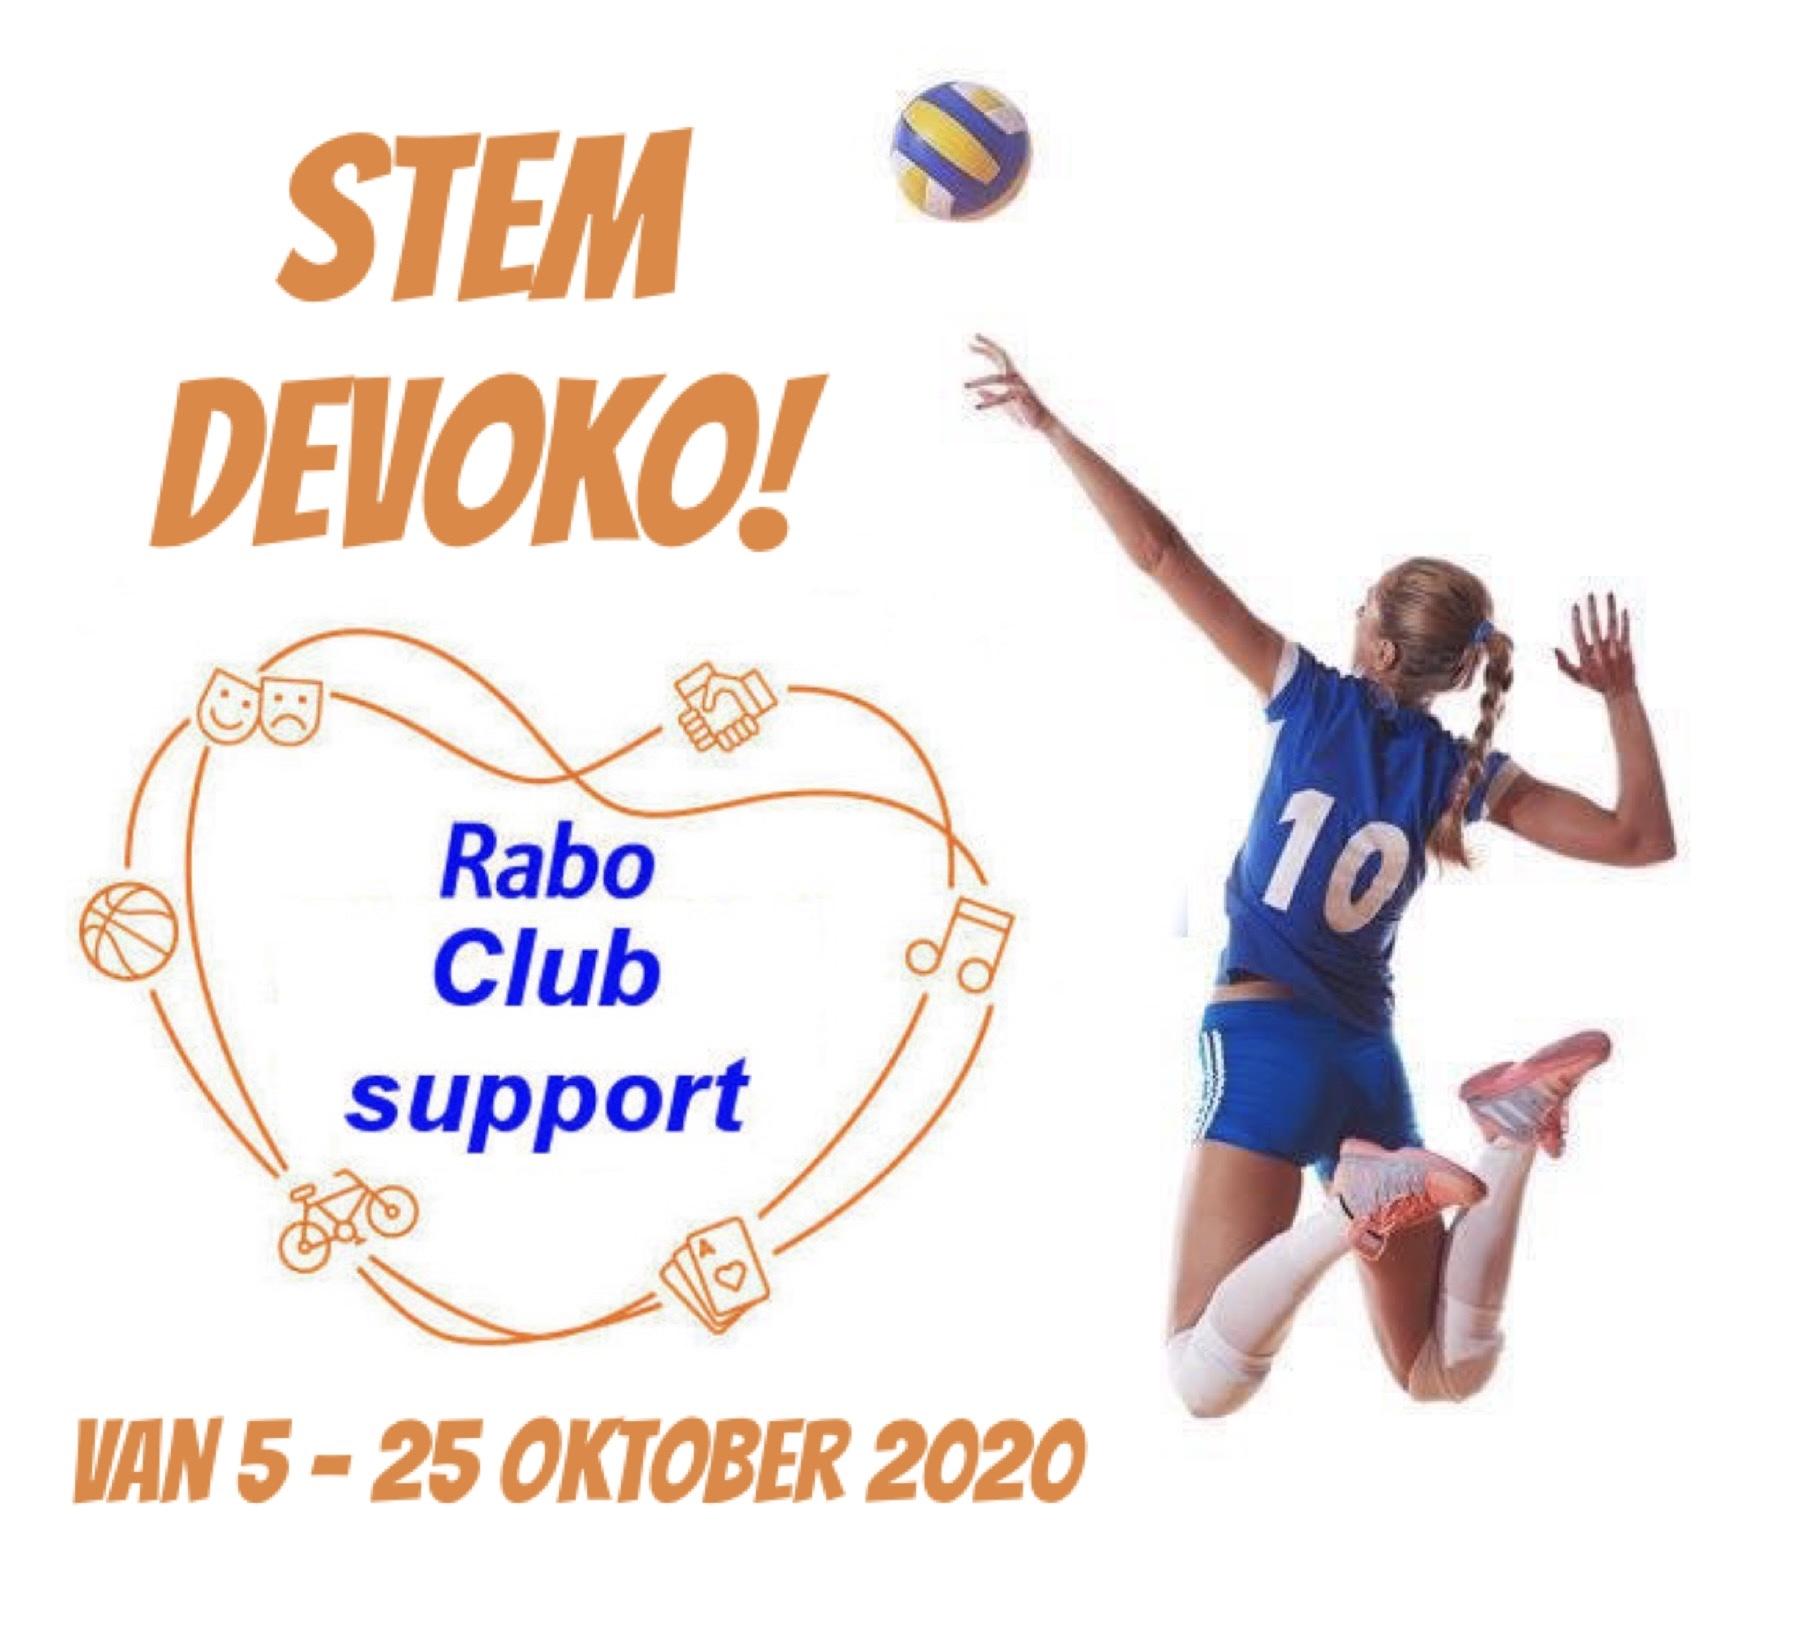 Stem DeVoKo op Rabo Club Support